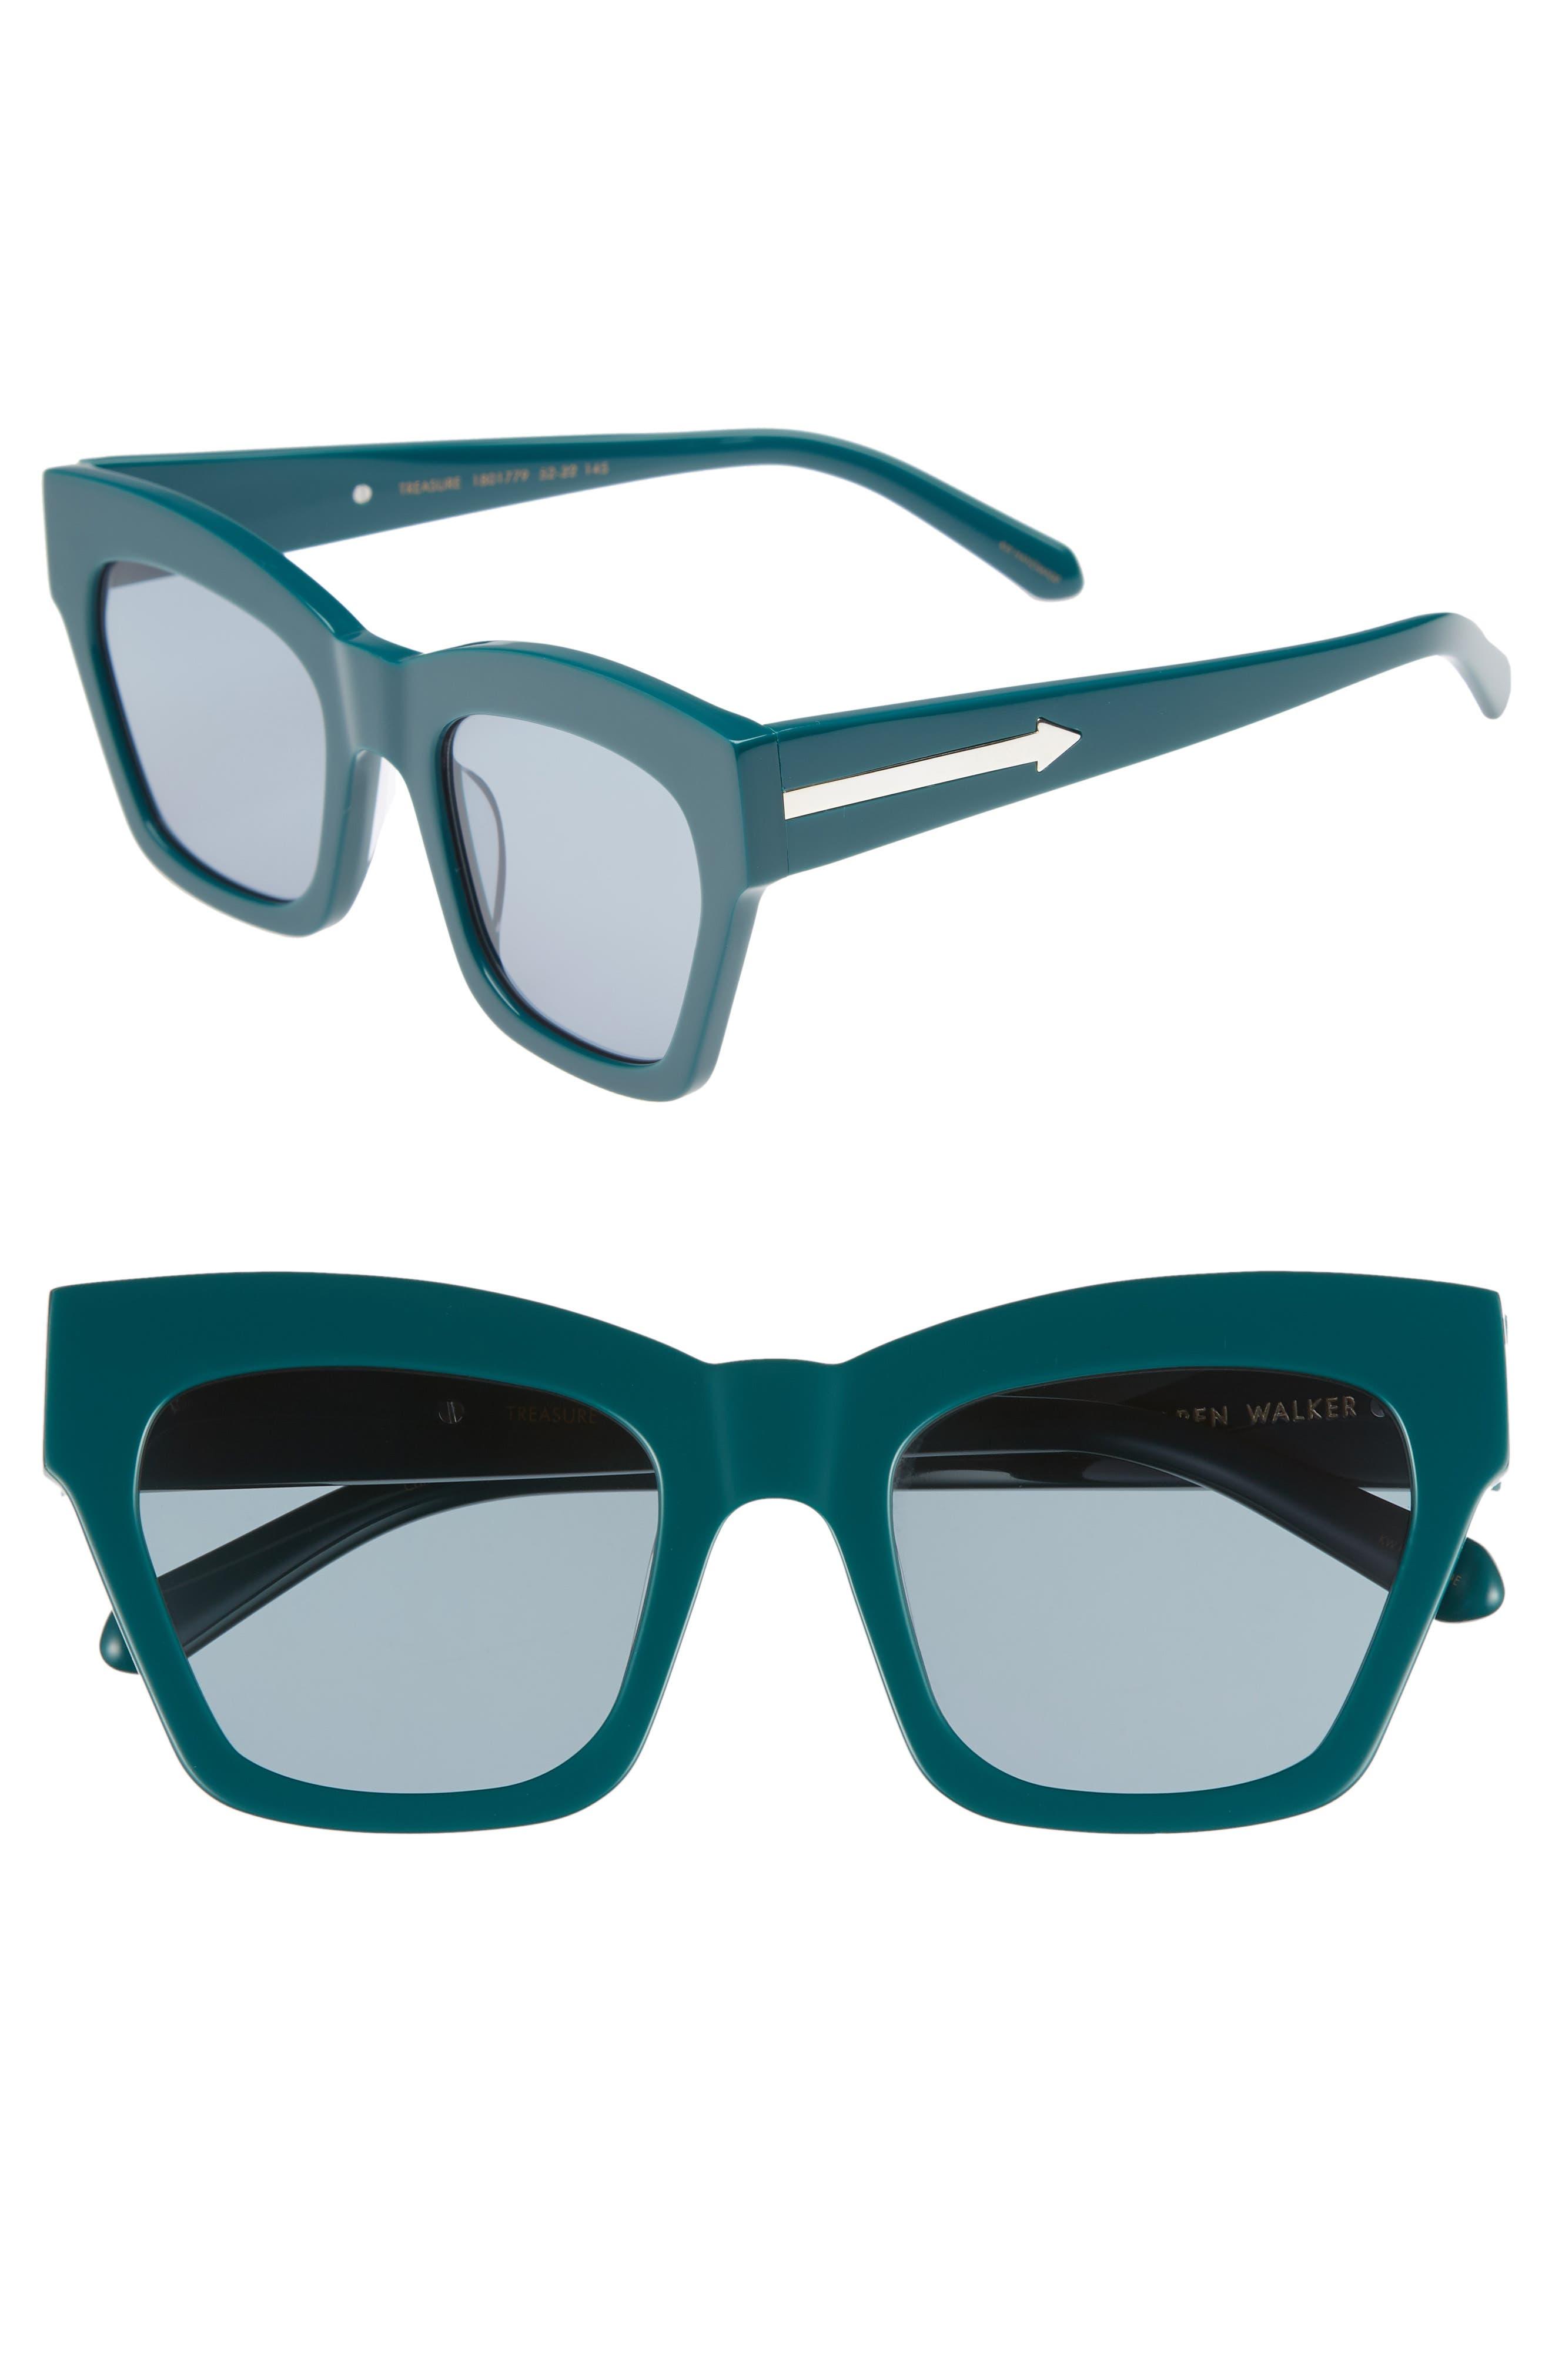 Treasure 52mm Cat Eye Sunglasses,                         Main,                         color, EMERALD/ EMERALD